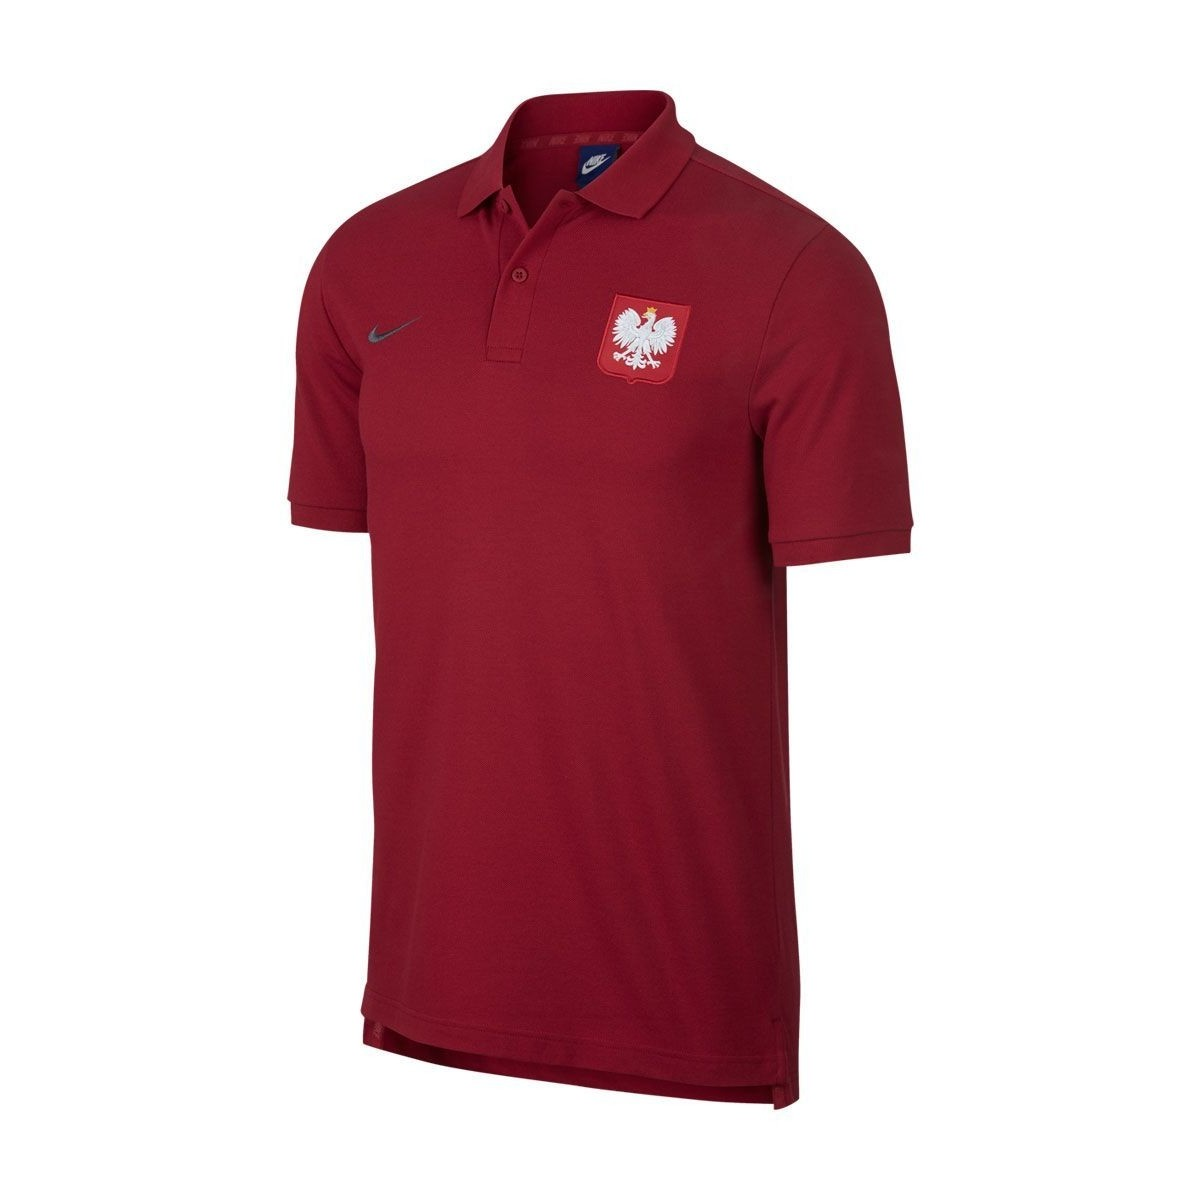 c7d52ff7b Koszulka Polo Nike Polska - czerwona